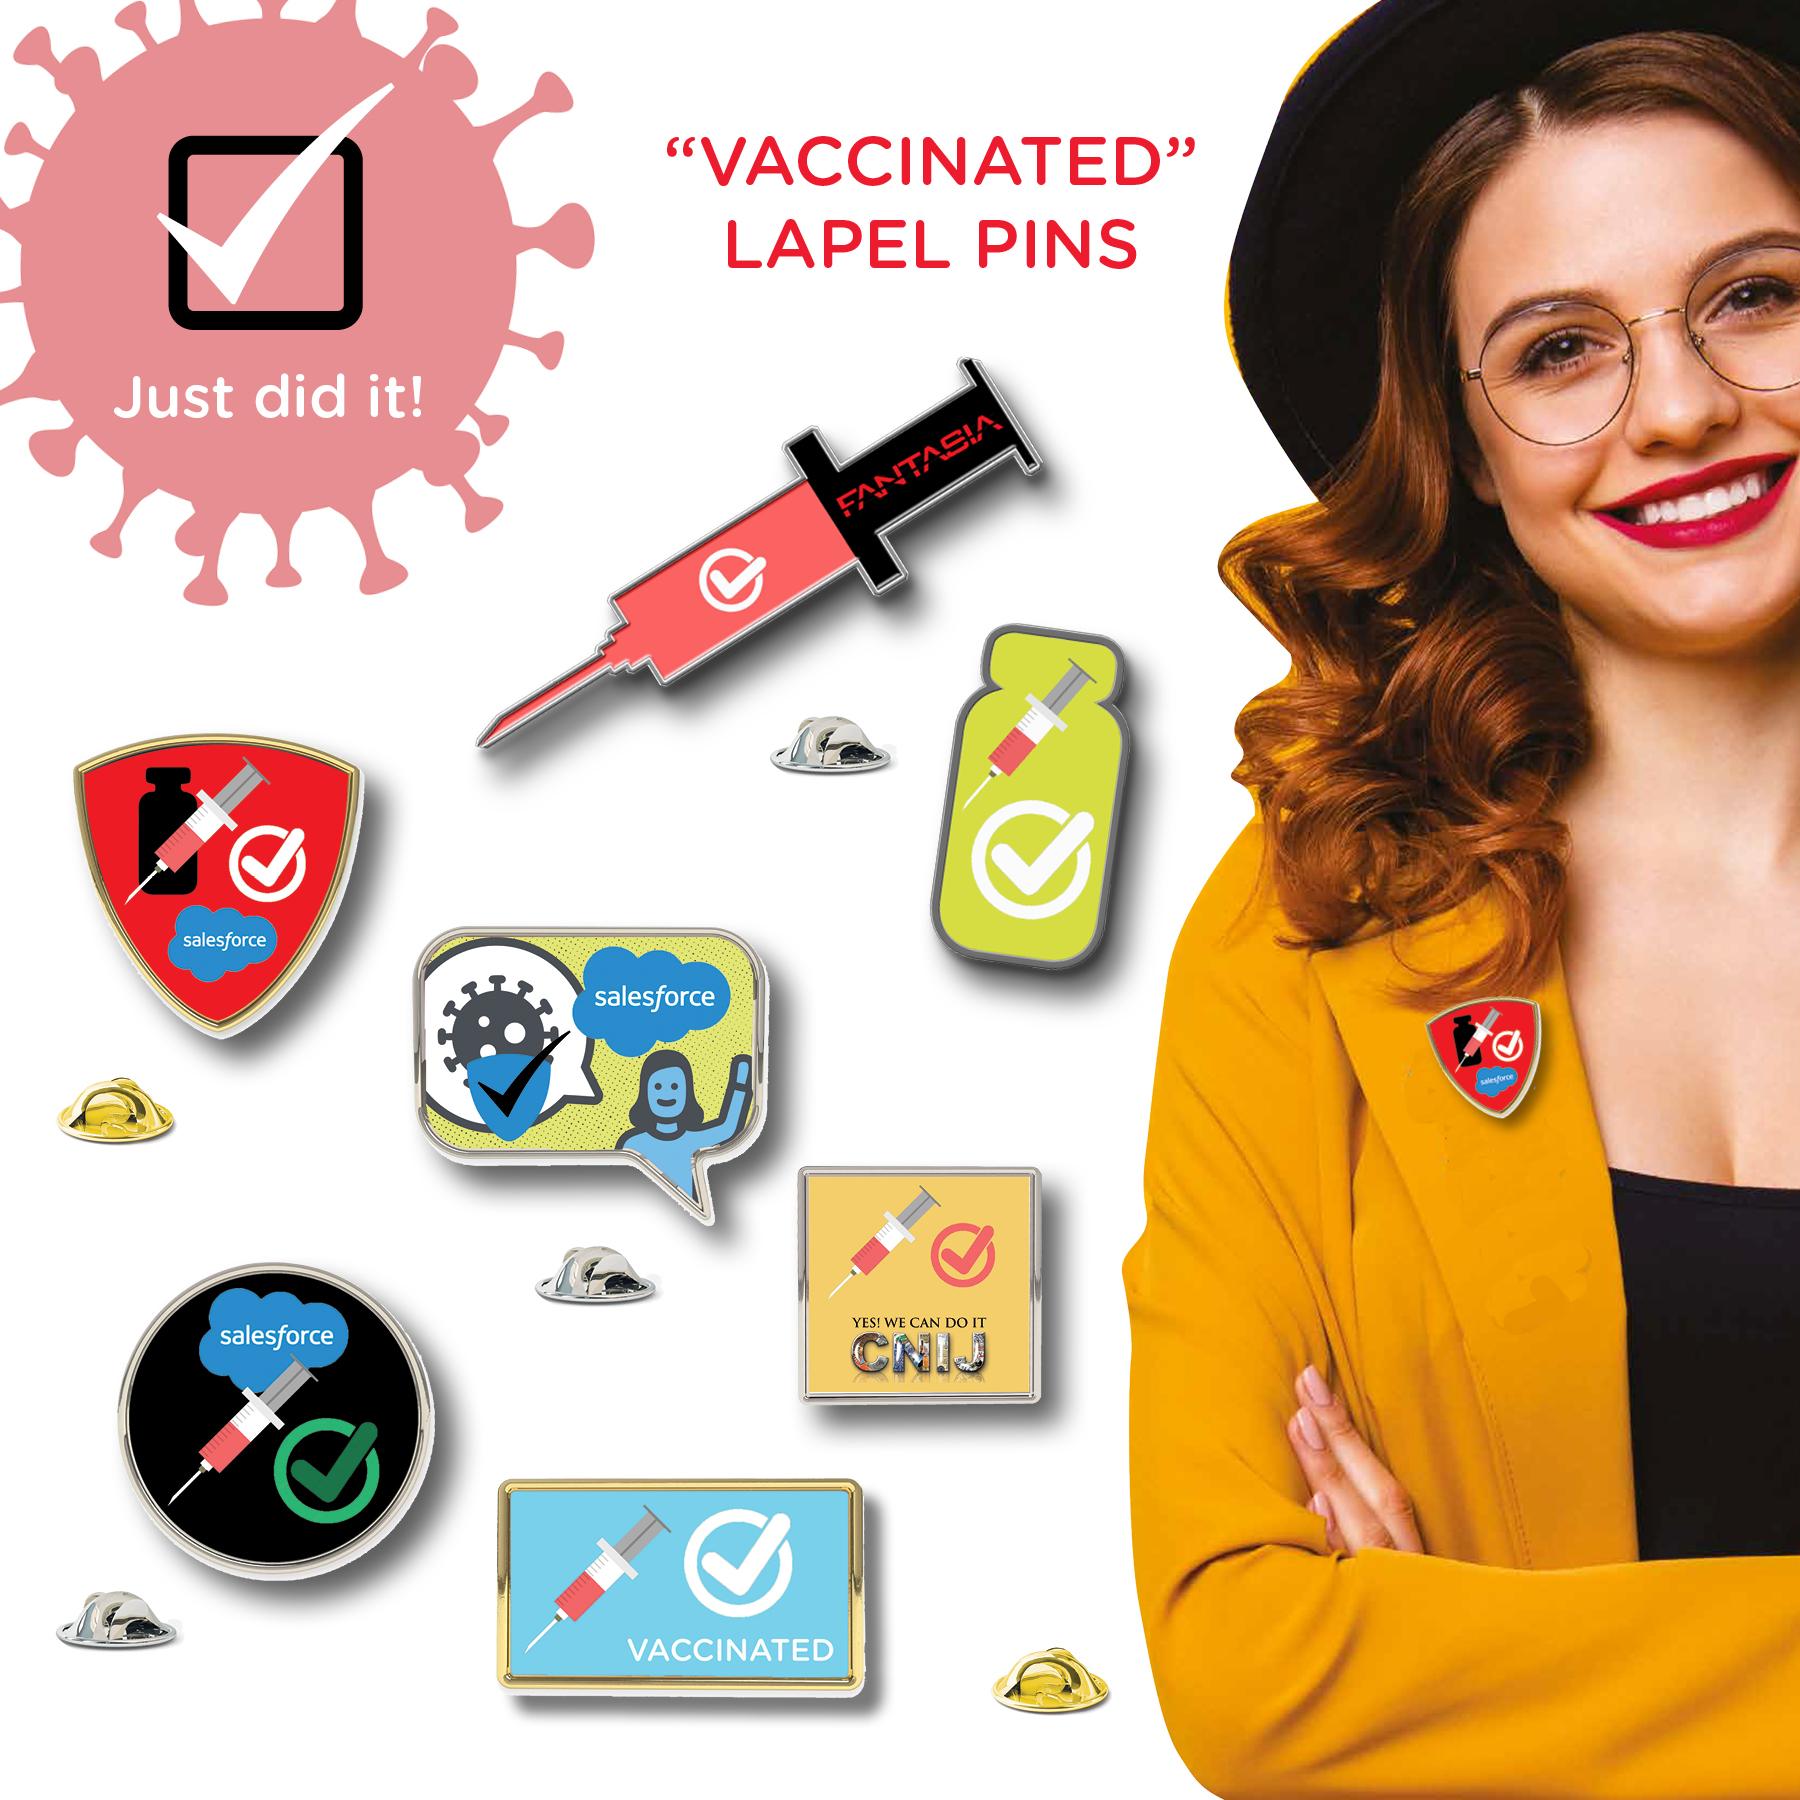 Vaccinated Lapel Pin